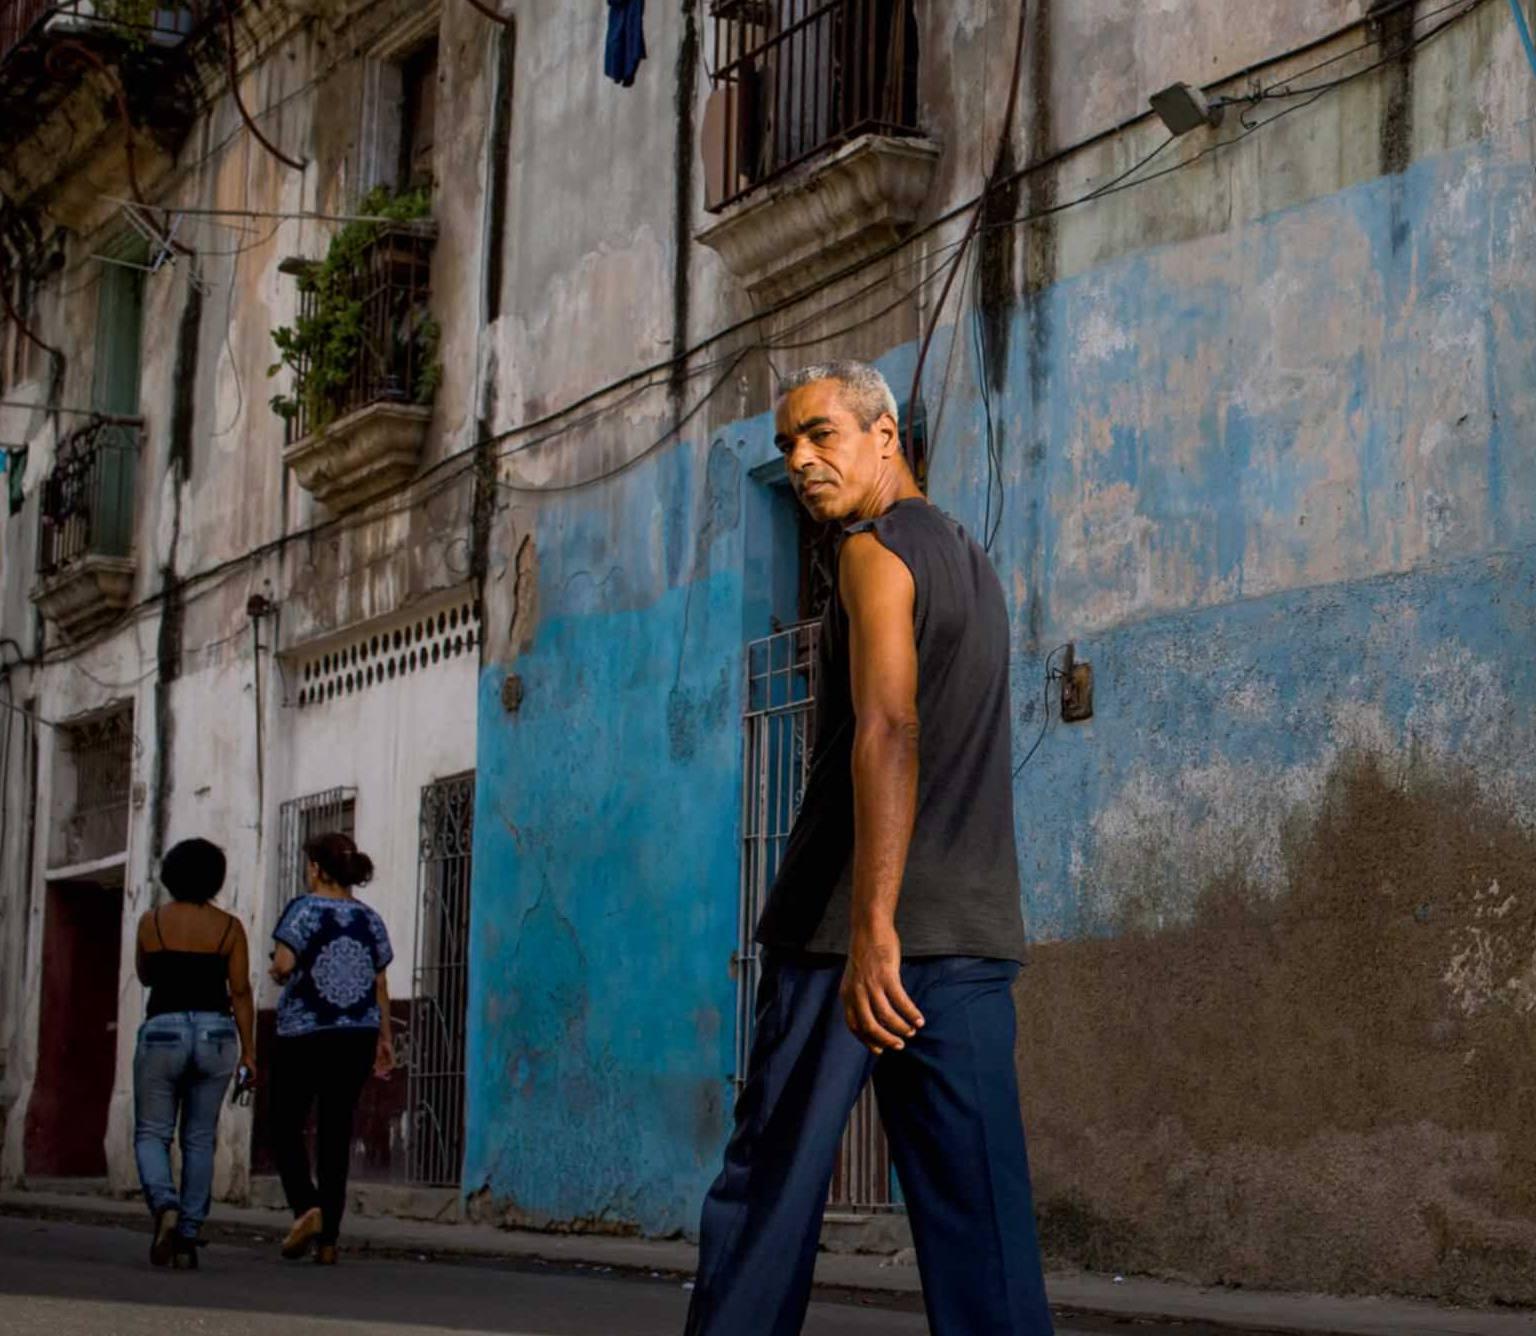 Havana On The Brink